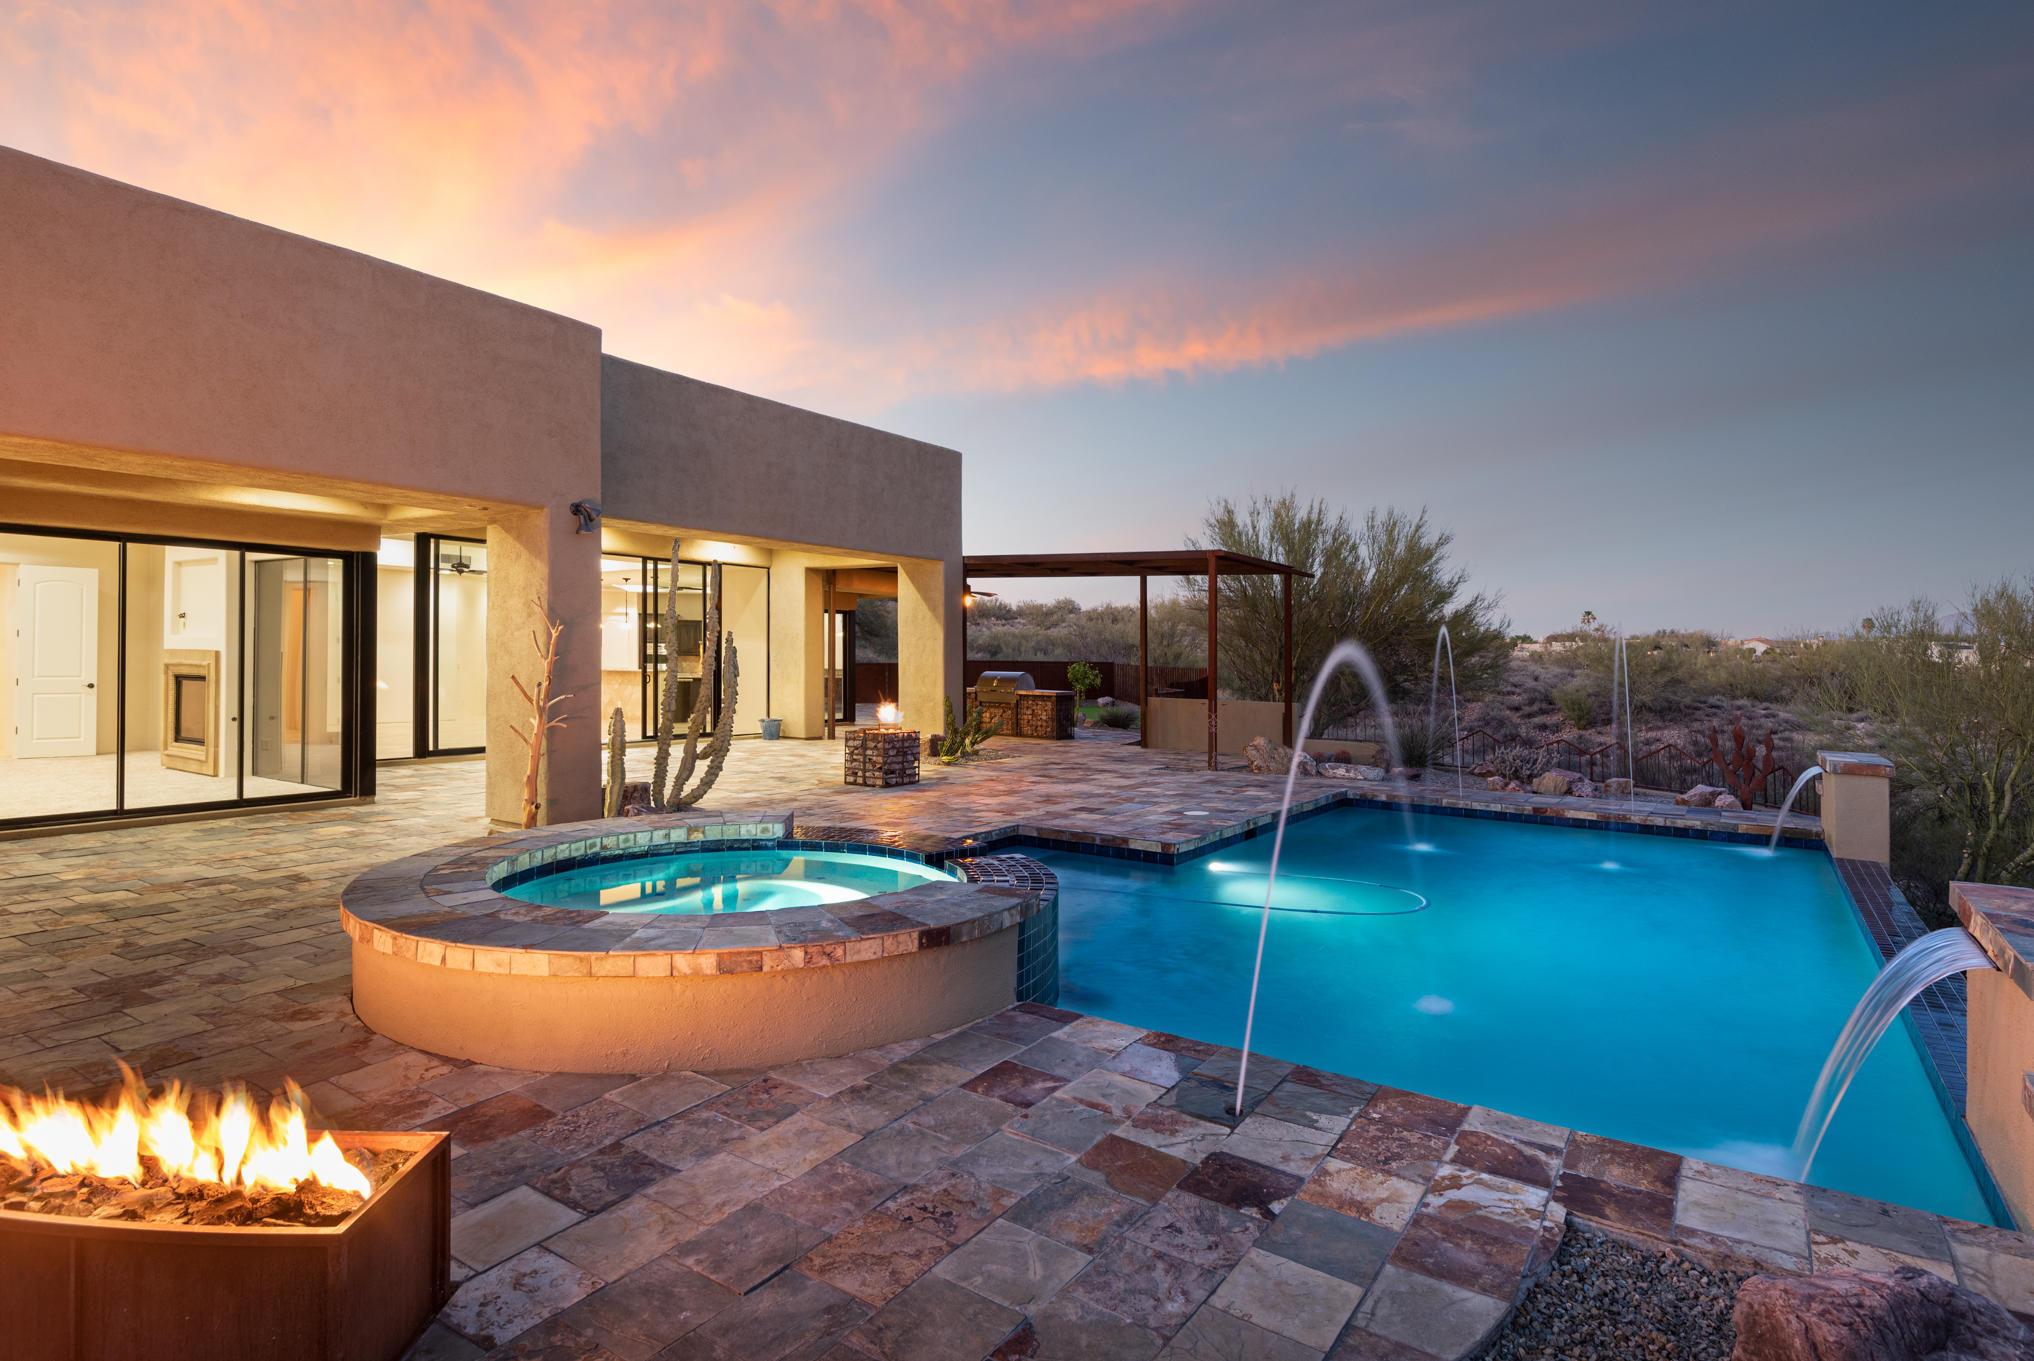 Photo of 12542 N Vistoso View Place, Oro Valley, AZ 85755